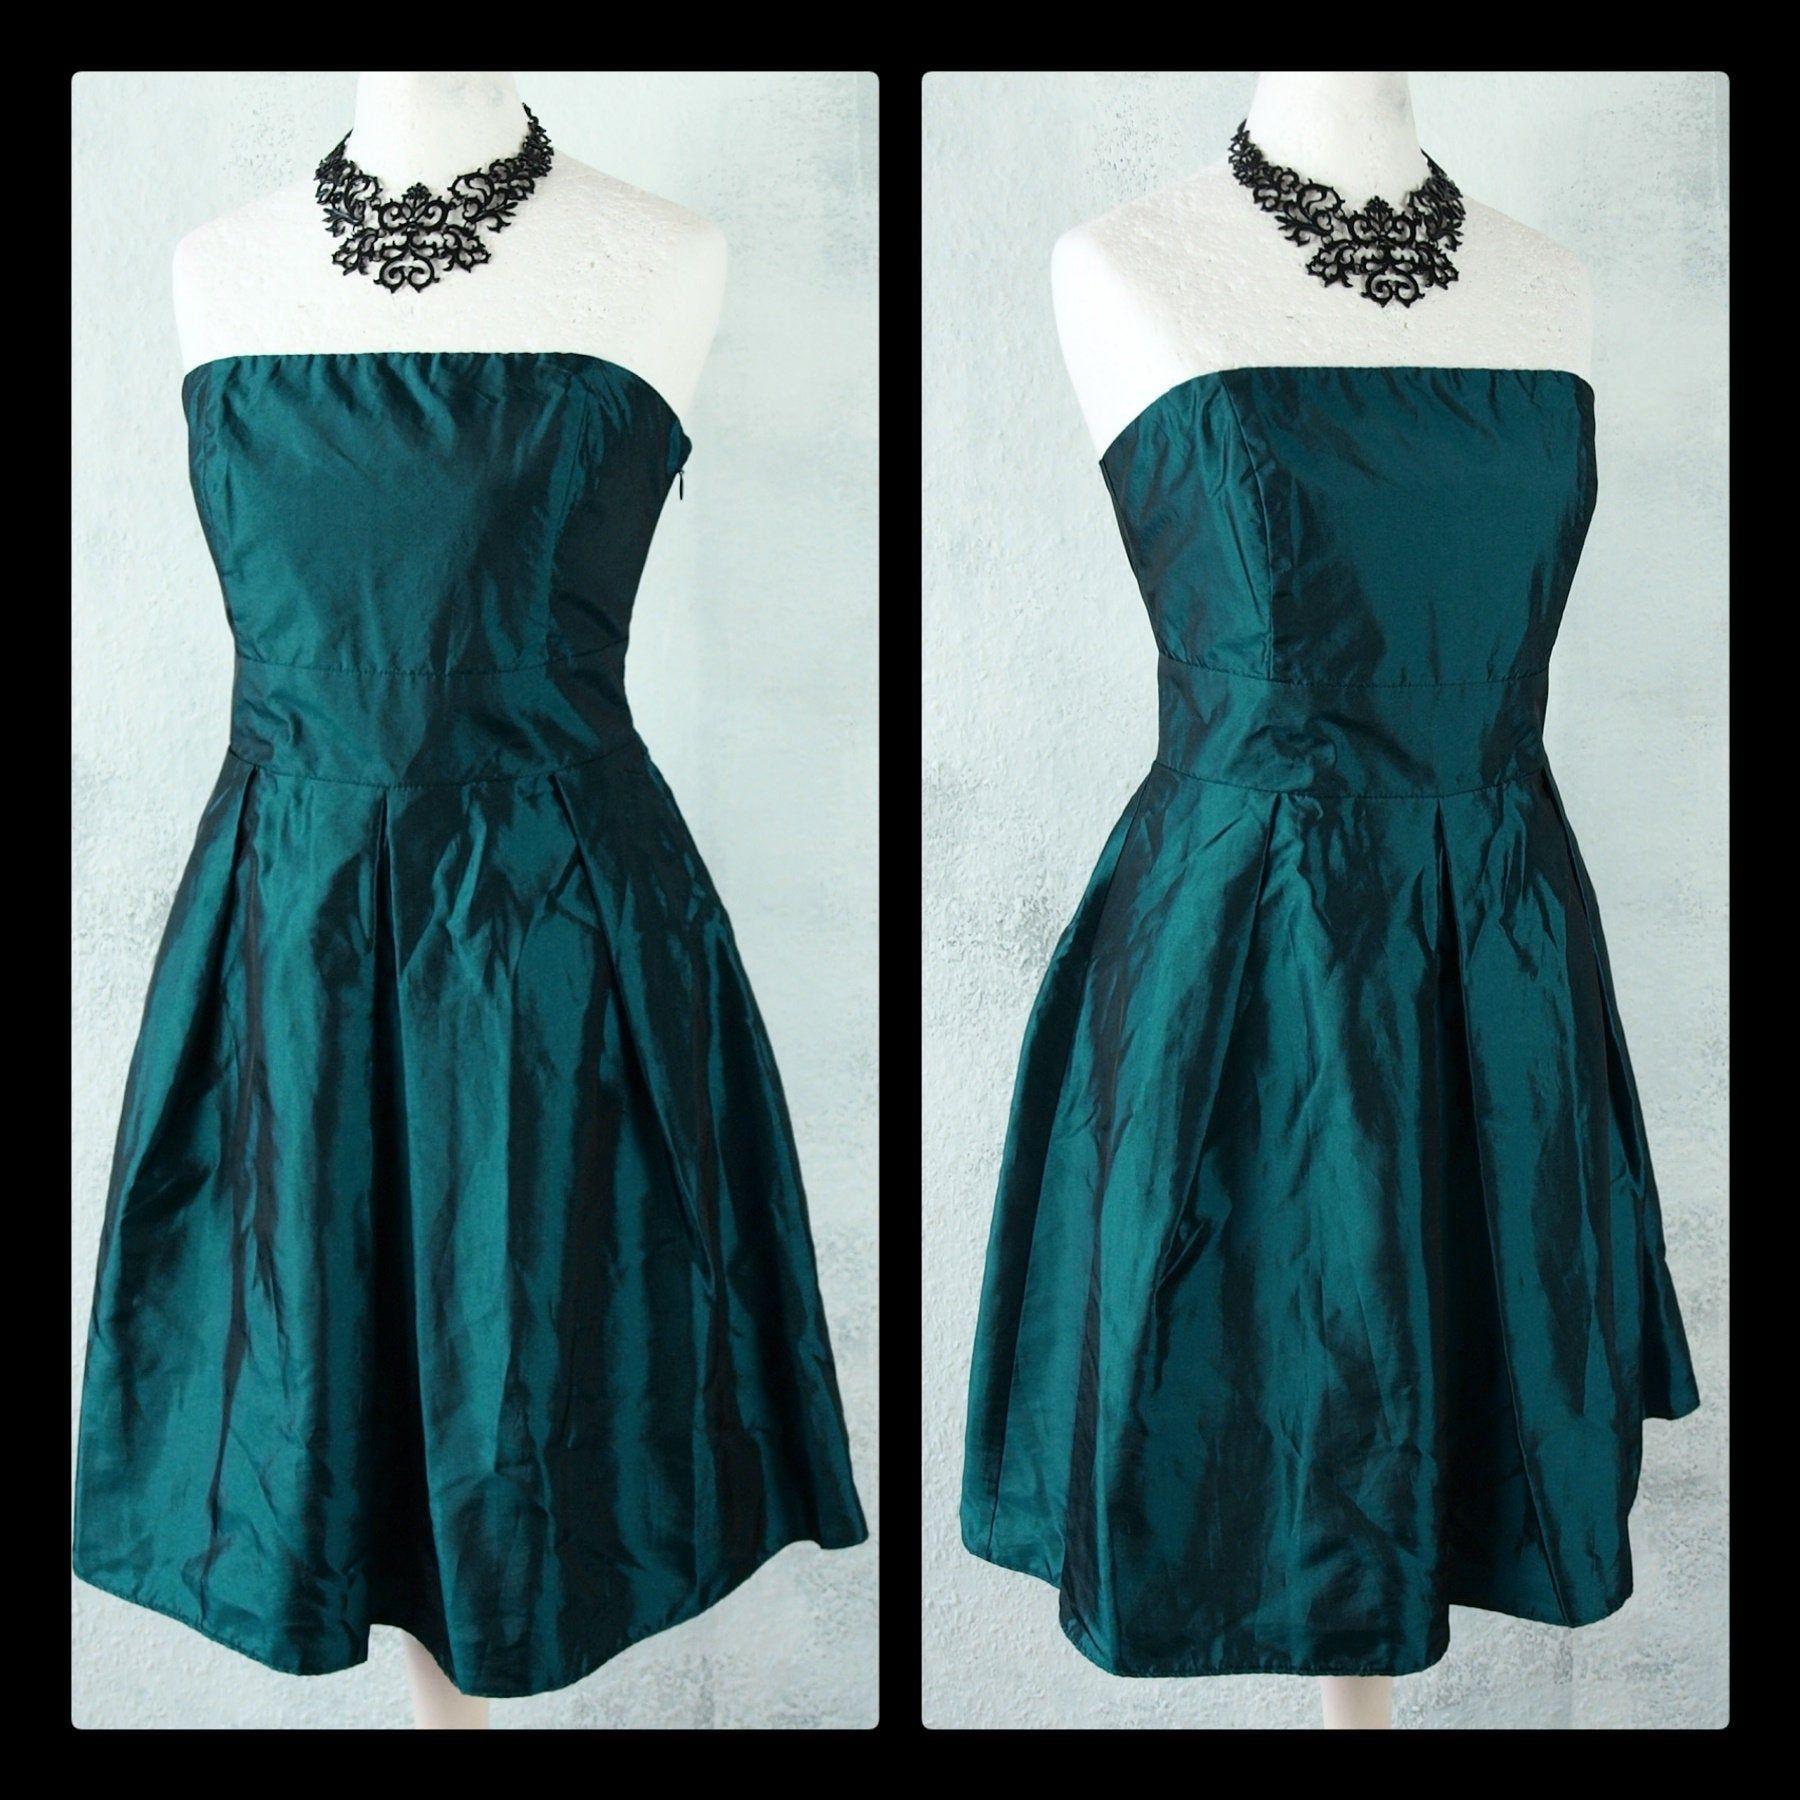 13 Großartig Abendkleid Upcycling StylishDesigner Einzigartig Abendkleid Upcycling Design